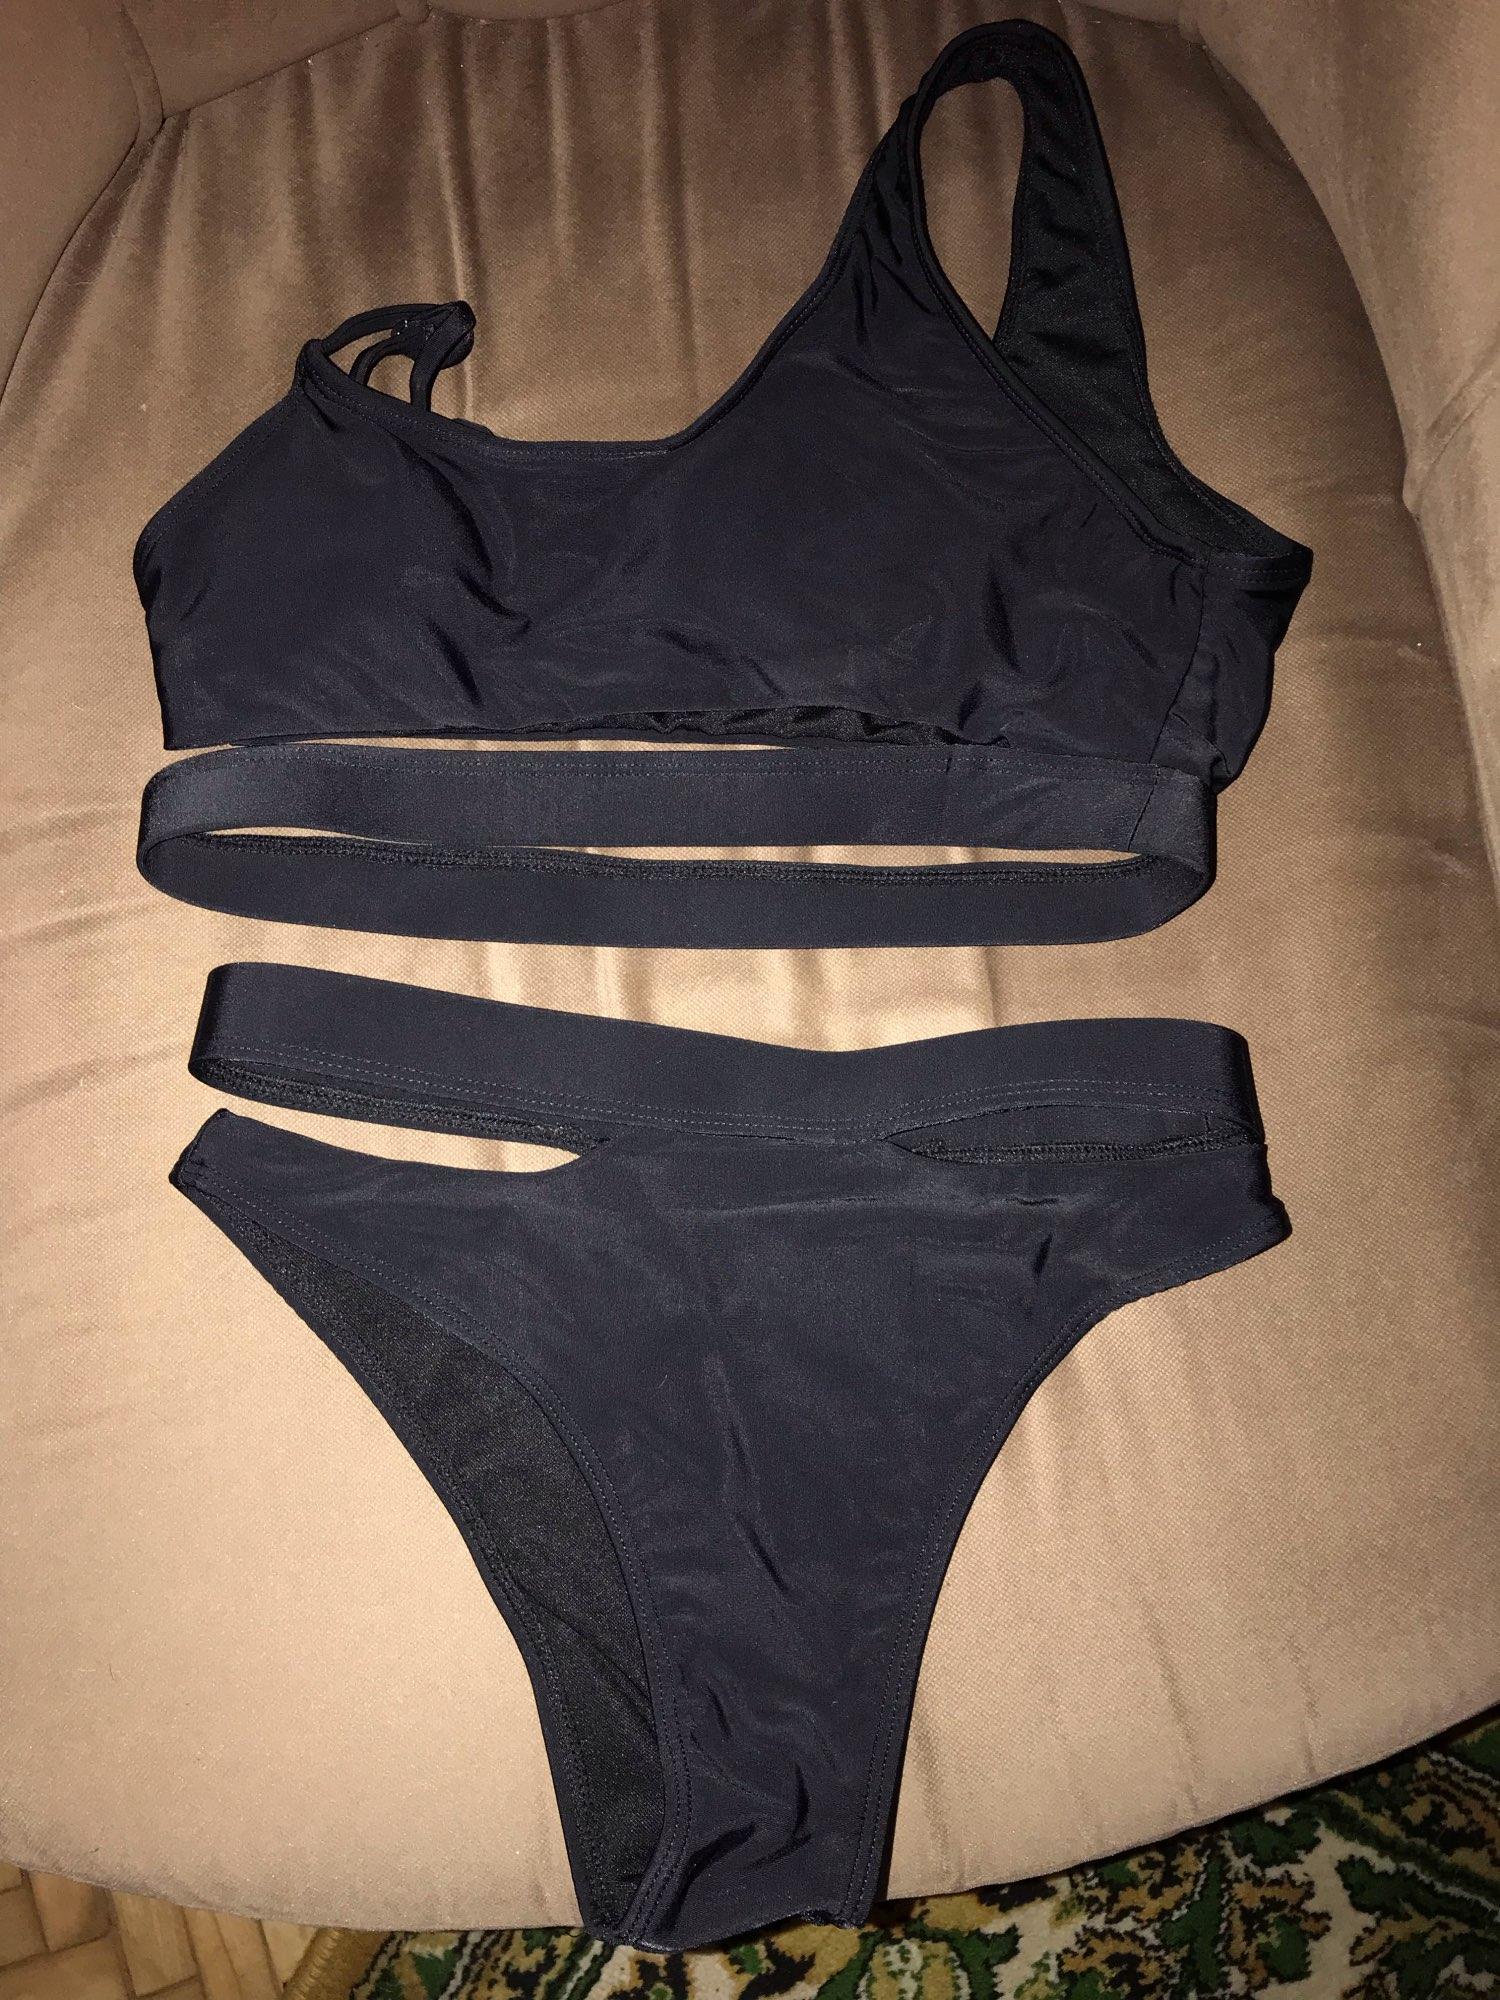 Sexy Bikini Female Swimsuit High Waist Swimwear 2021 Women Swimwear Two Pieces Bikini Set Solid Bather Bathing Suit Swim|Bikini Set|   - AliExpress